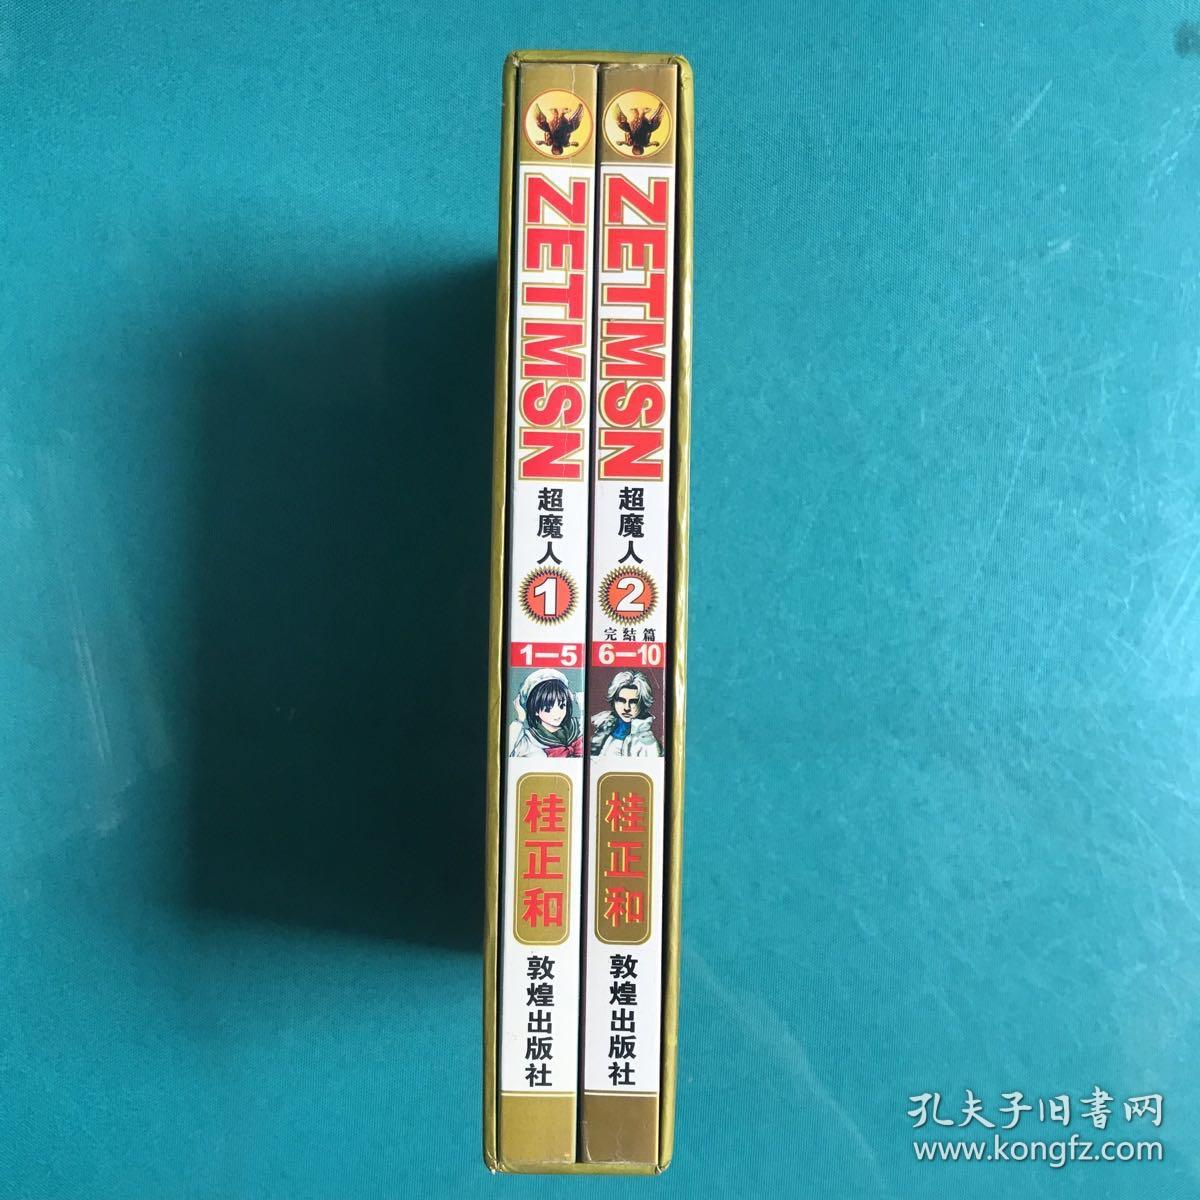 ZETMSN 超魔人(全2册)